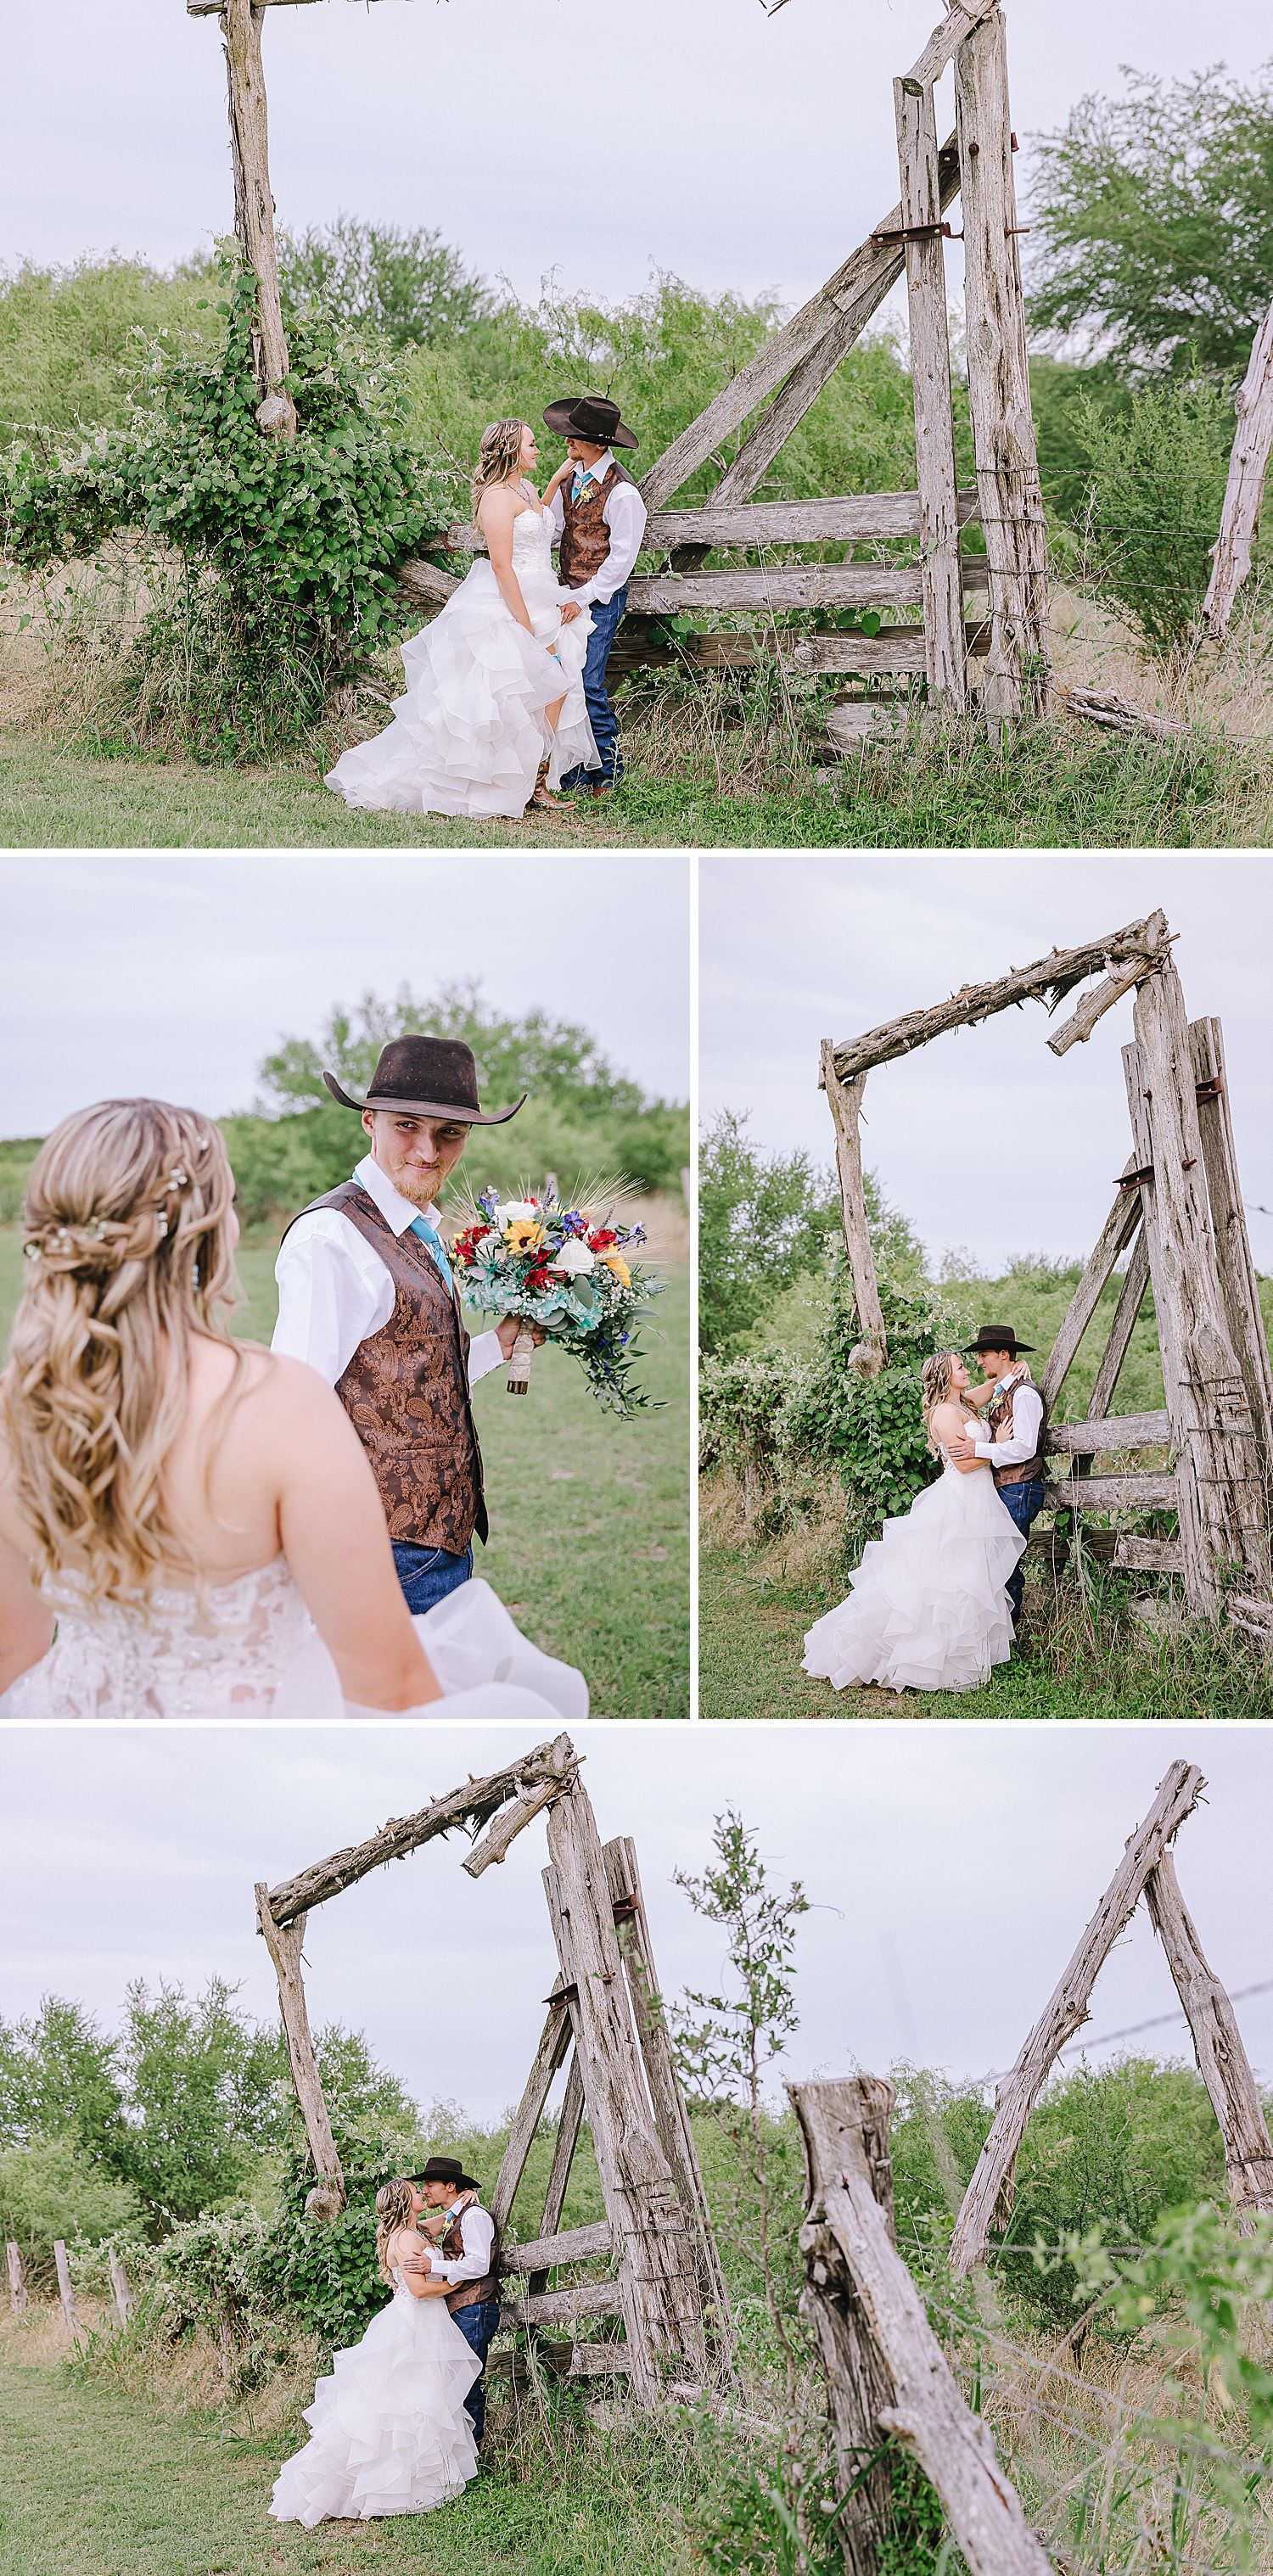 Carly-Barton-Photography-Old-Town-Texas-Rustic-Wedding-Photos-Sunflowers-Boots-Kyle-Texas_0062.jpg